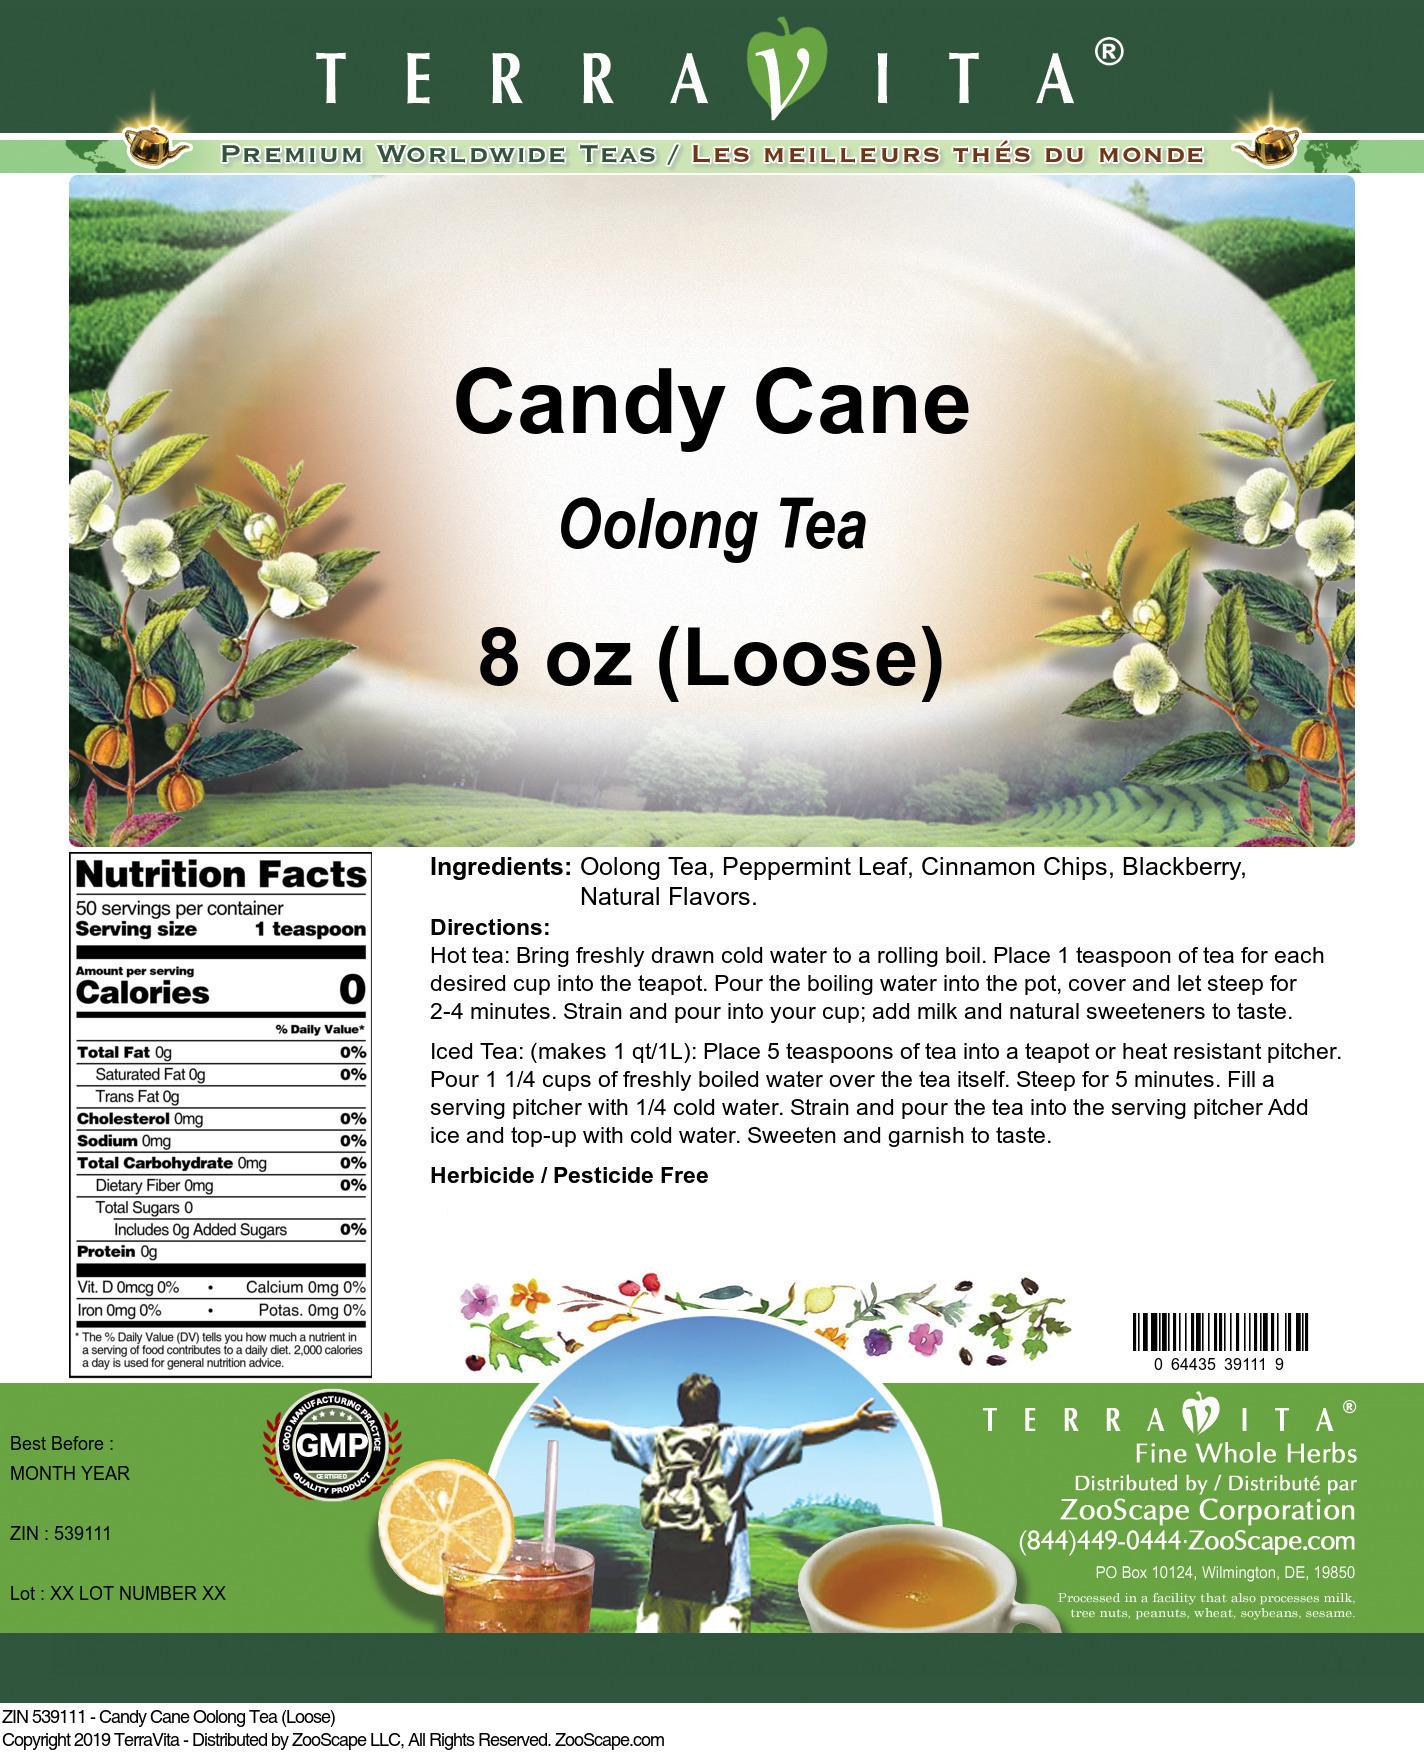 Candy Cane Oolong Tea